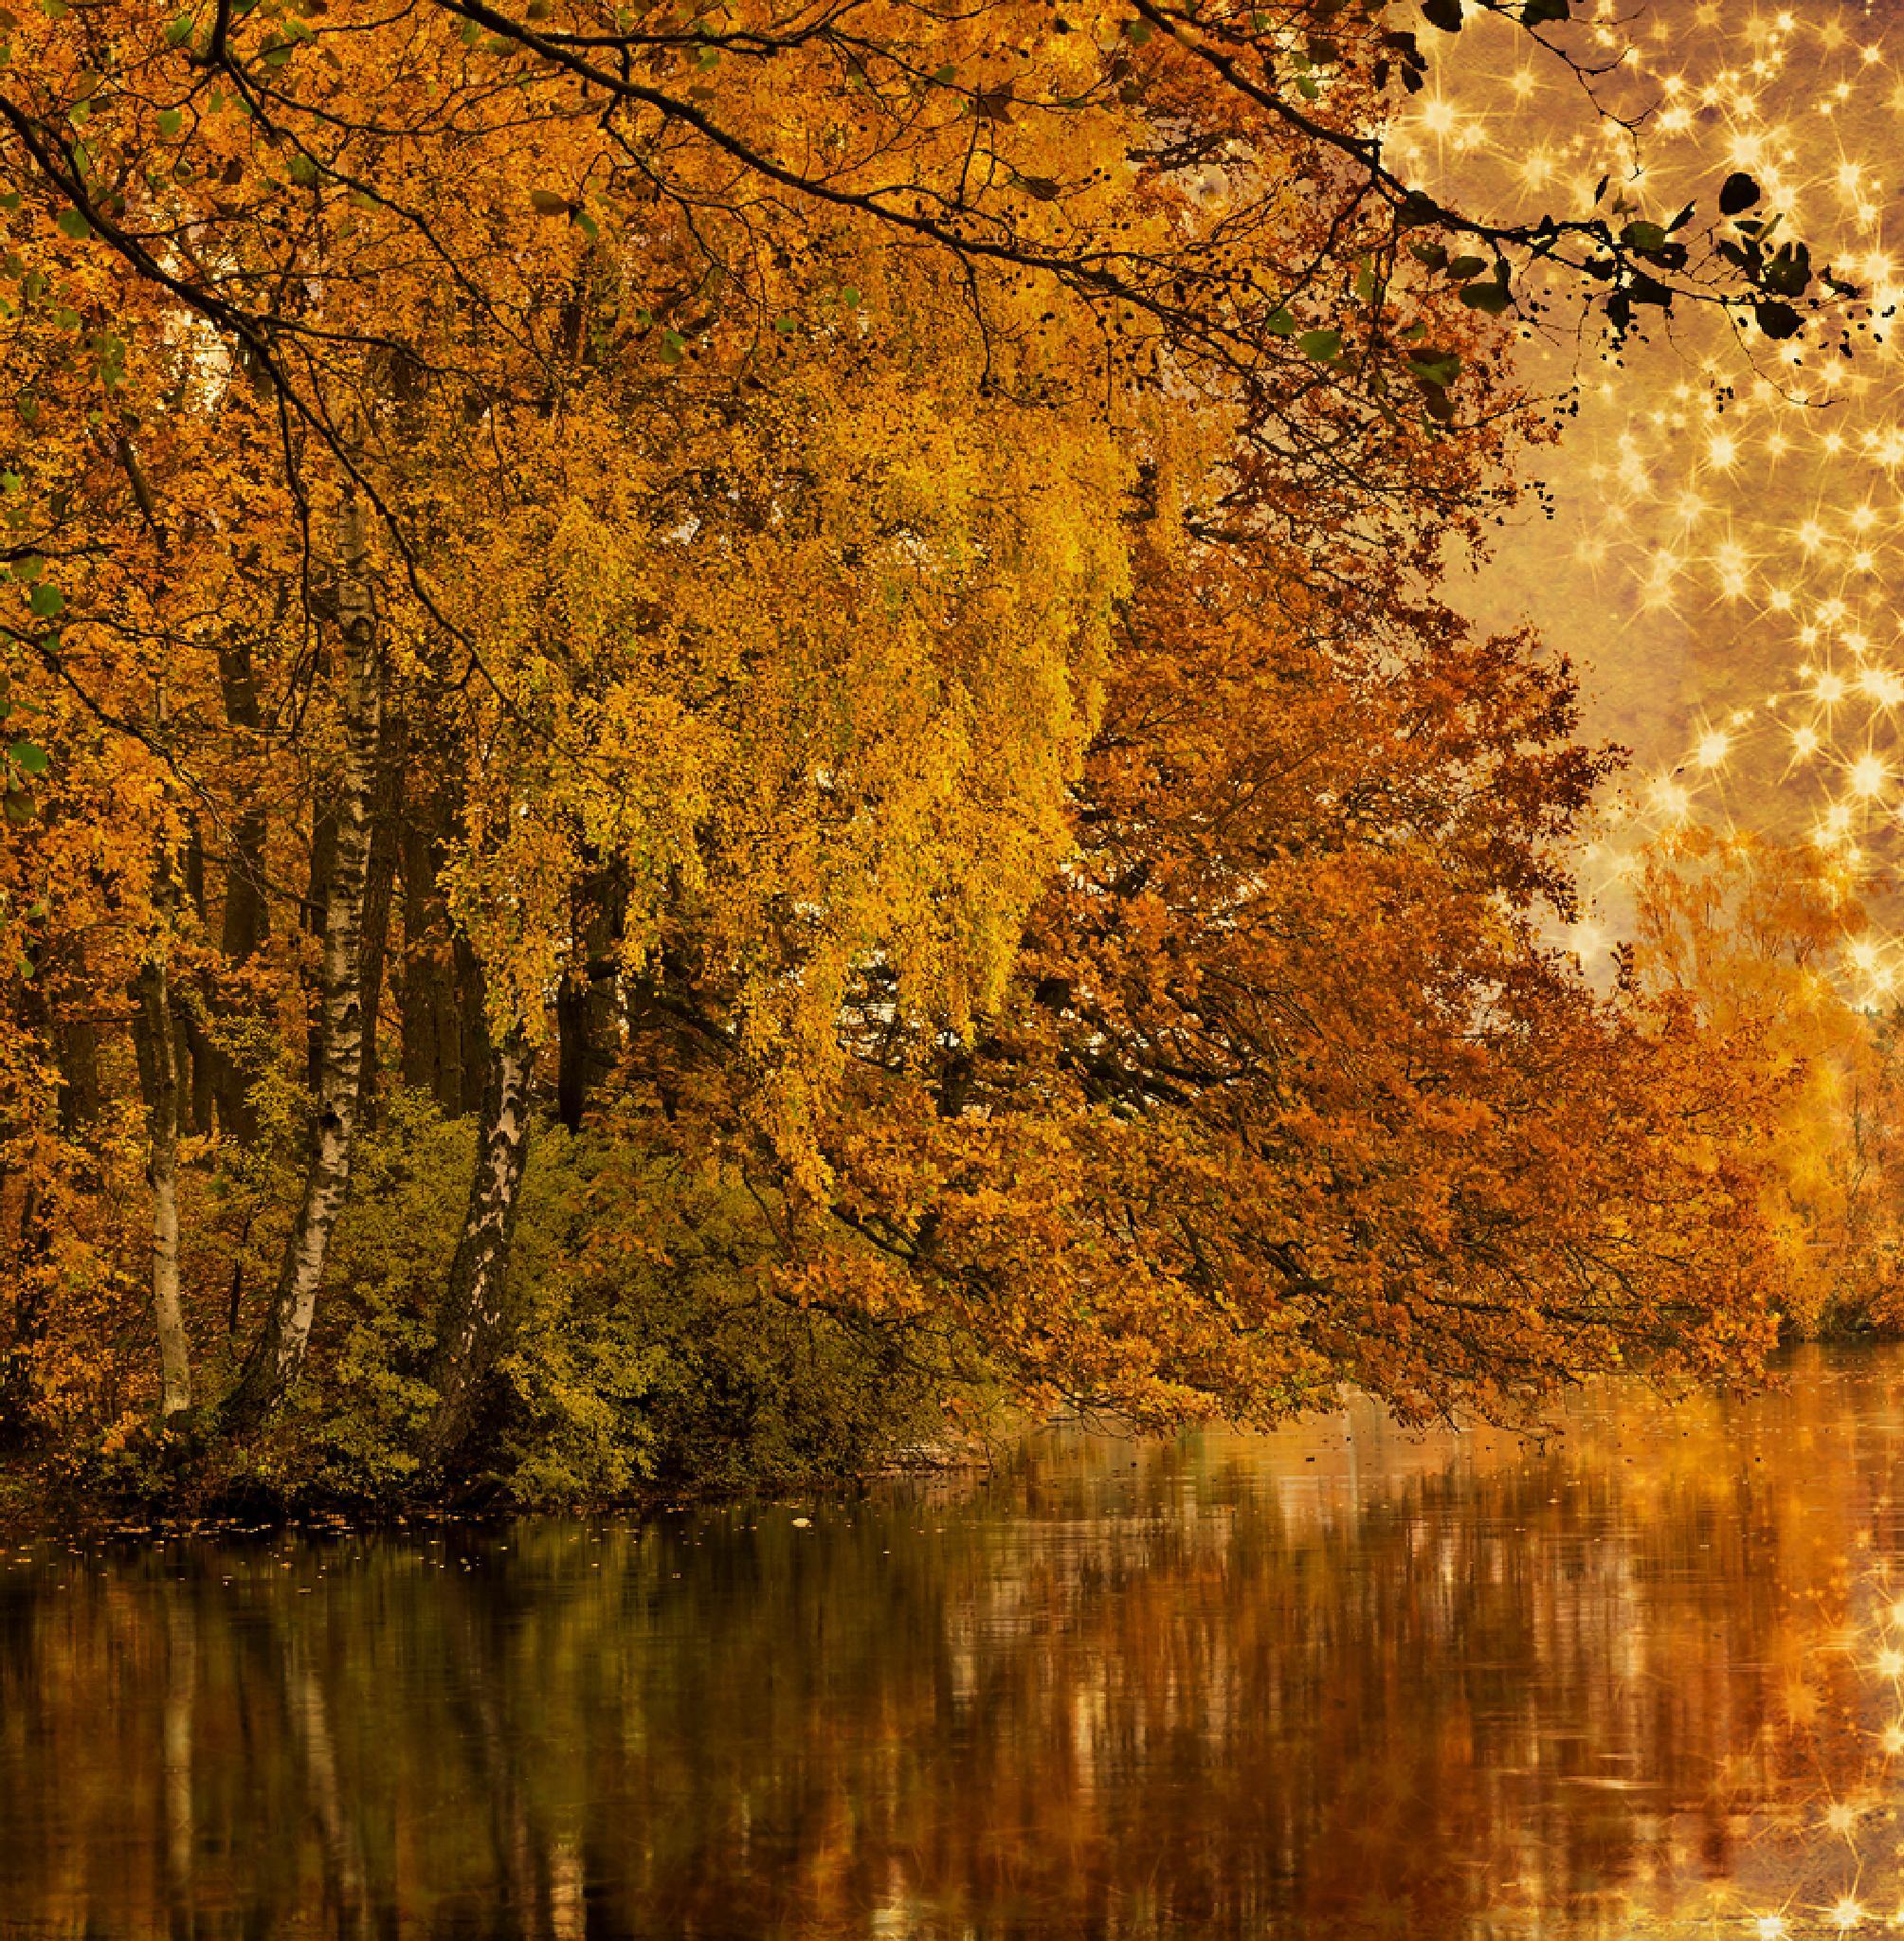 Golden autumn by Peter Samuelsson